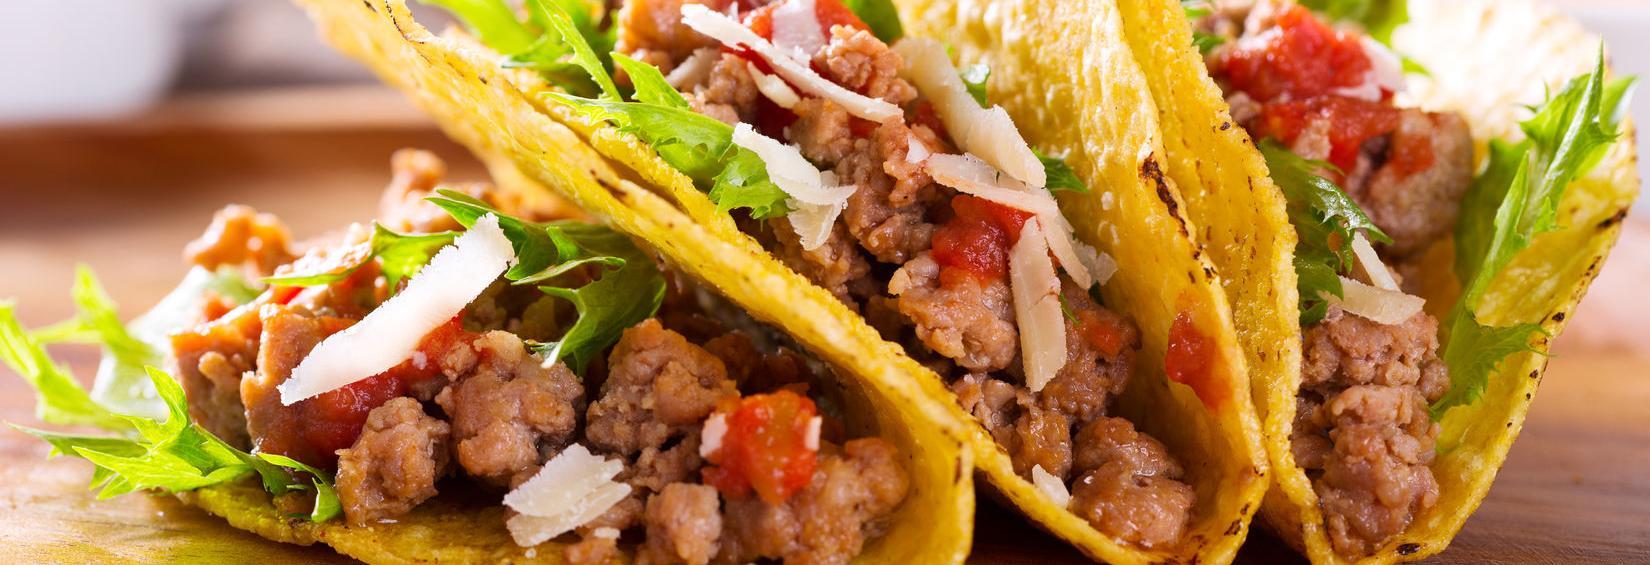 Plato Loco Mexican Restaurant in Red Oak banner